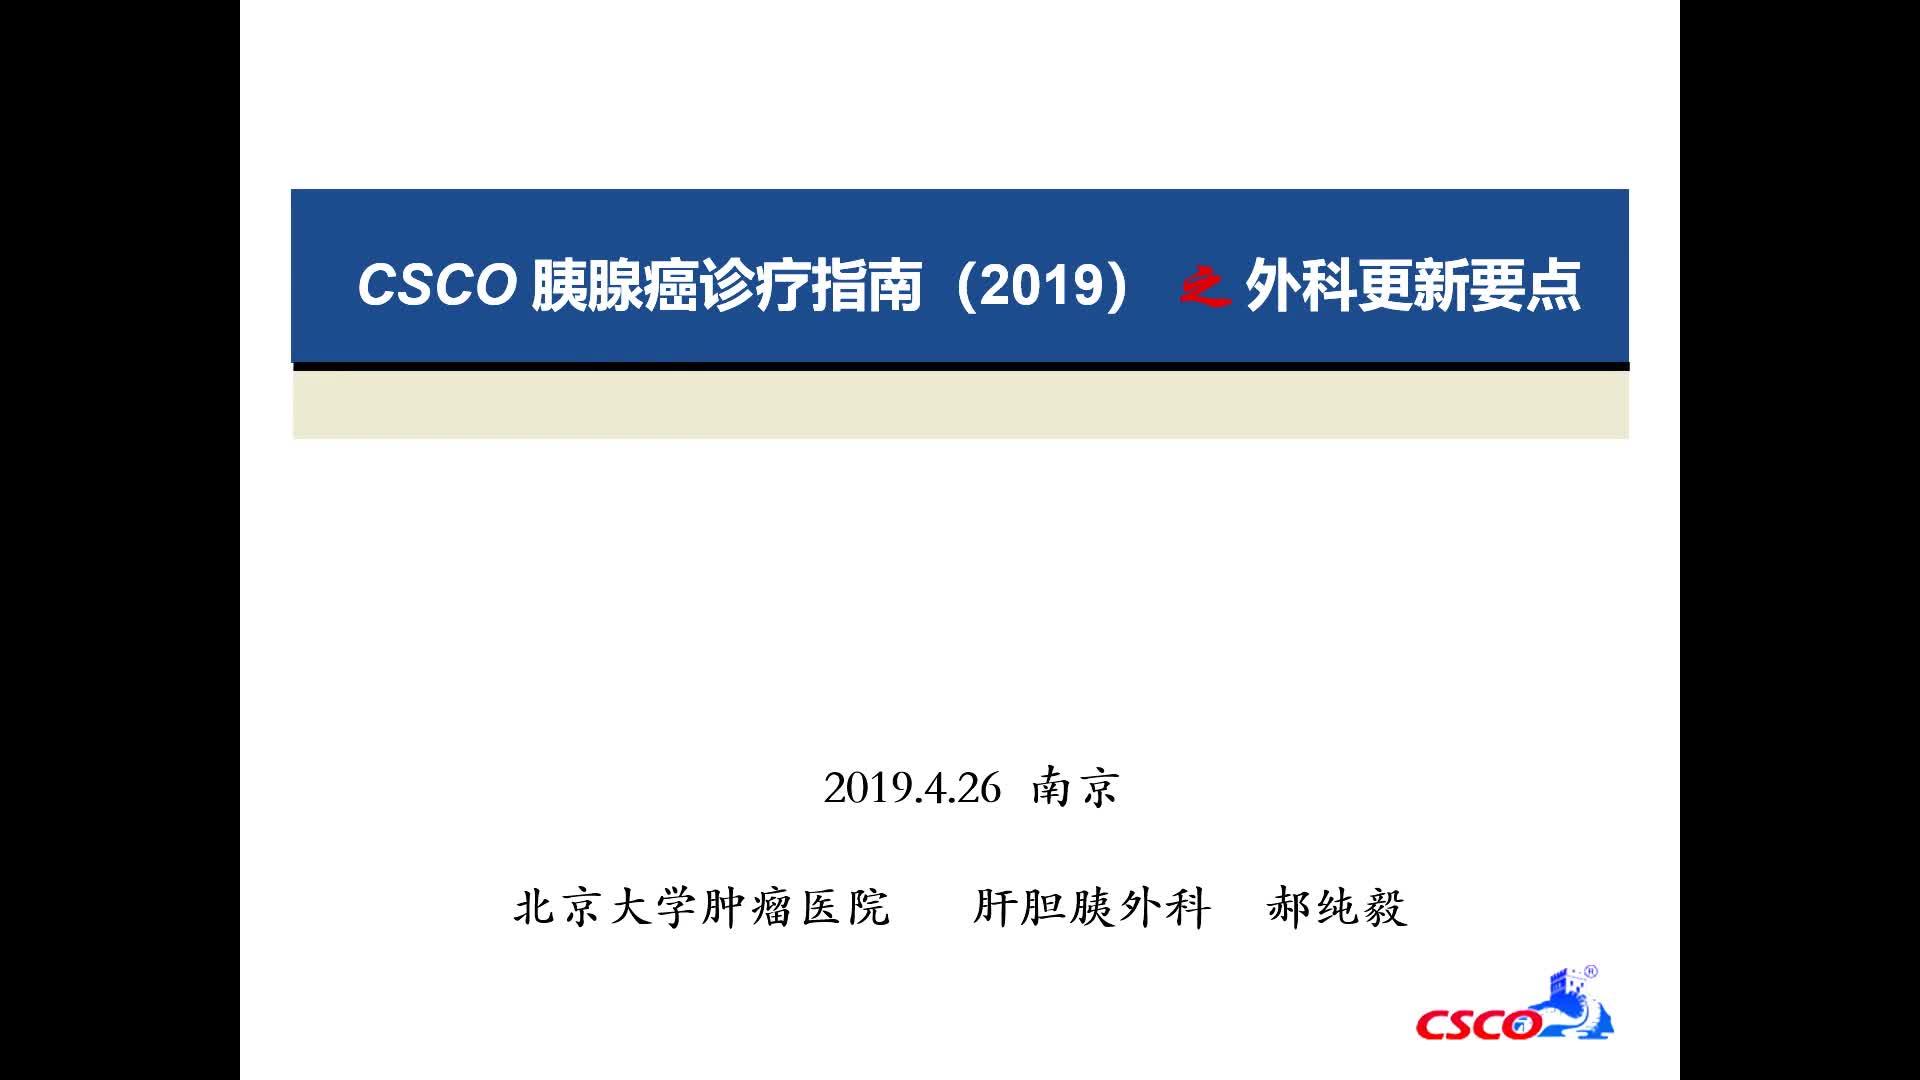 2019 CSCO胰腺癌诊疗指南外科进展解读